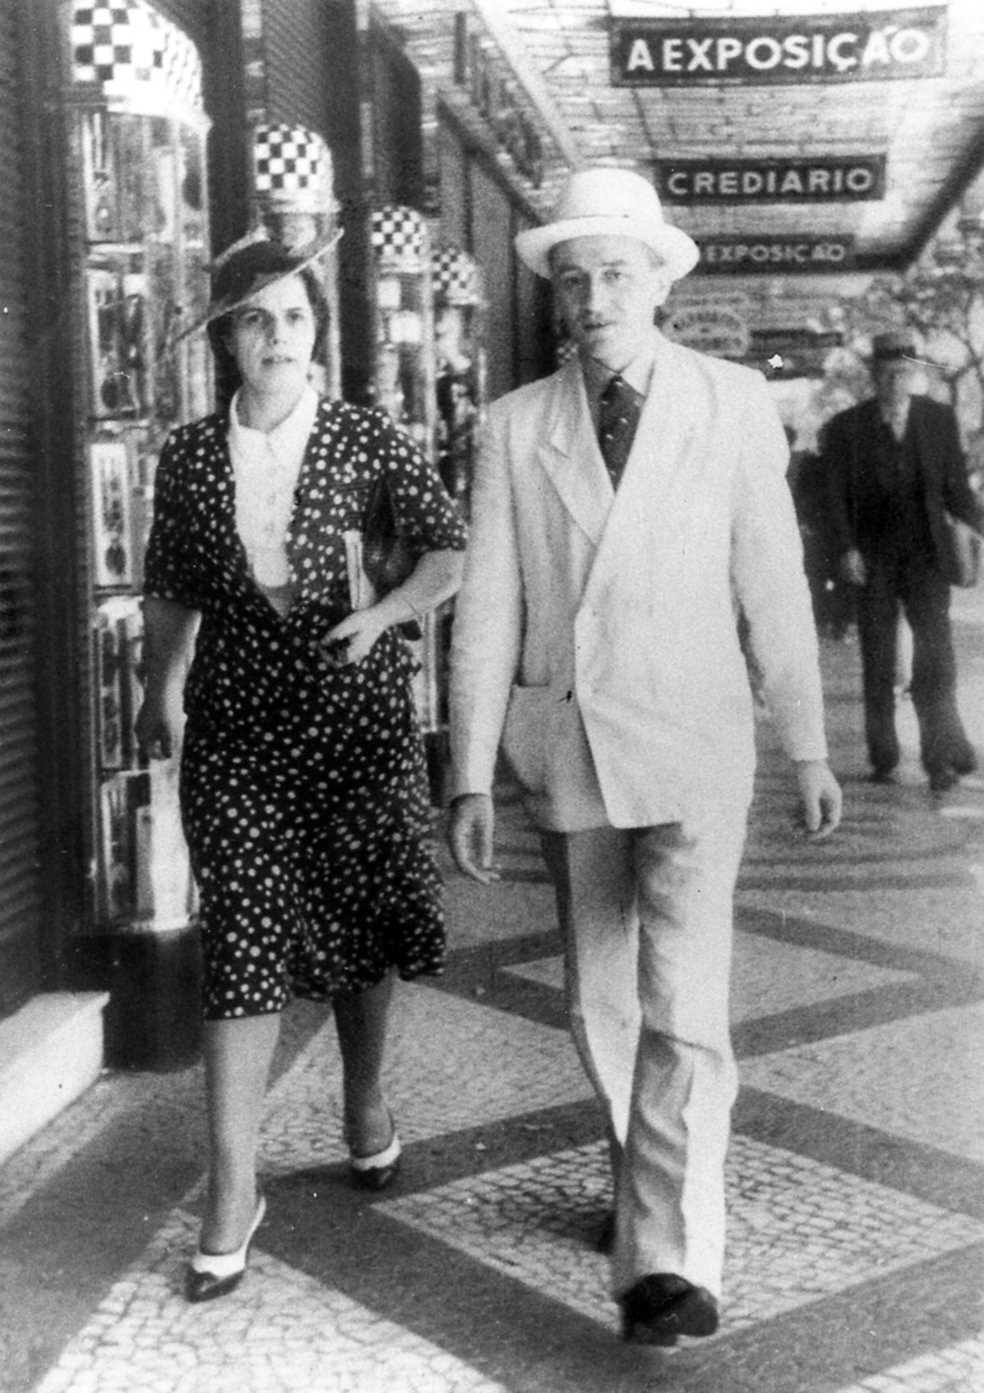 Emma Neri i Nello Garavini passetjant per l'Avinguda Rio Branco de Rio de Janeiro (anys quaranta)